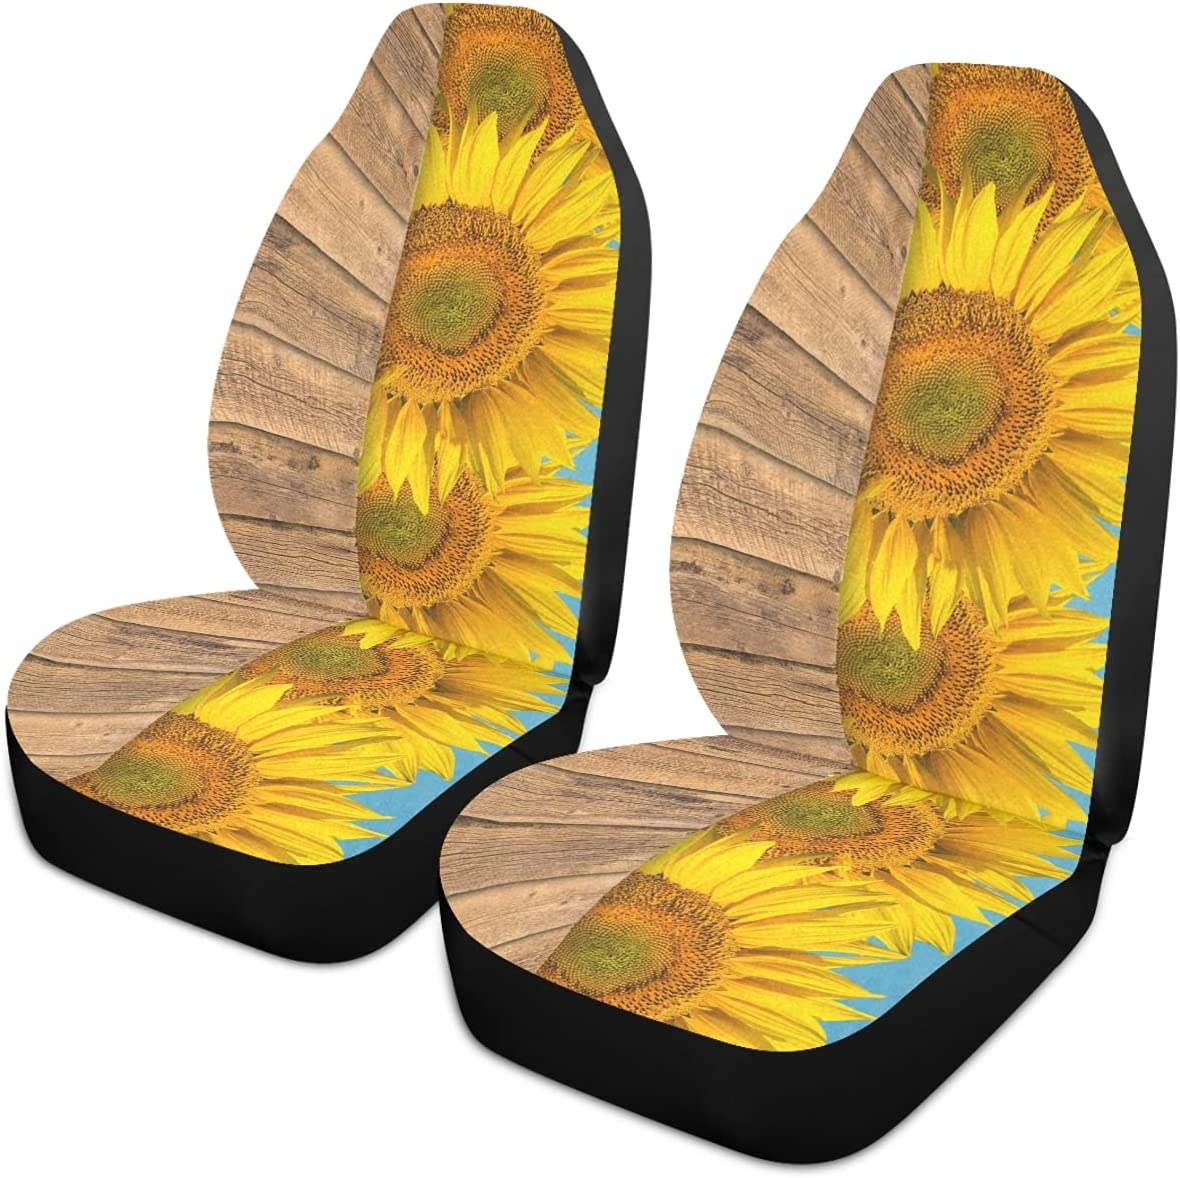 Oarencol Sunflower Sale item Floral Wooden Blue Las Vegas Mall Covers Seat Sky Car Univer